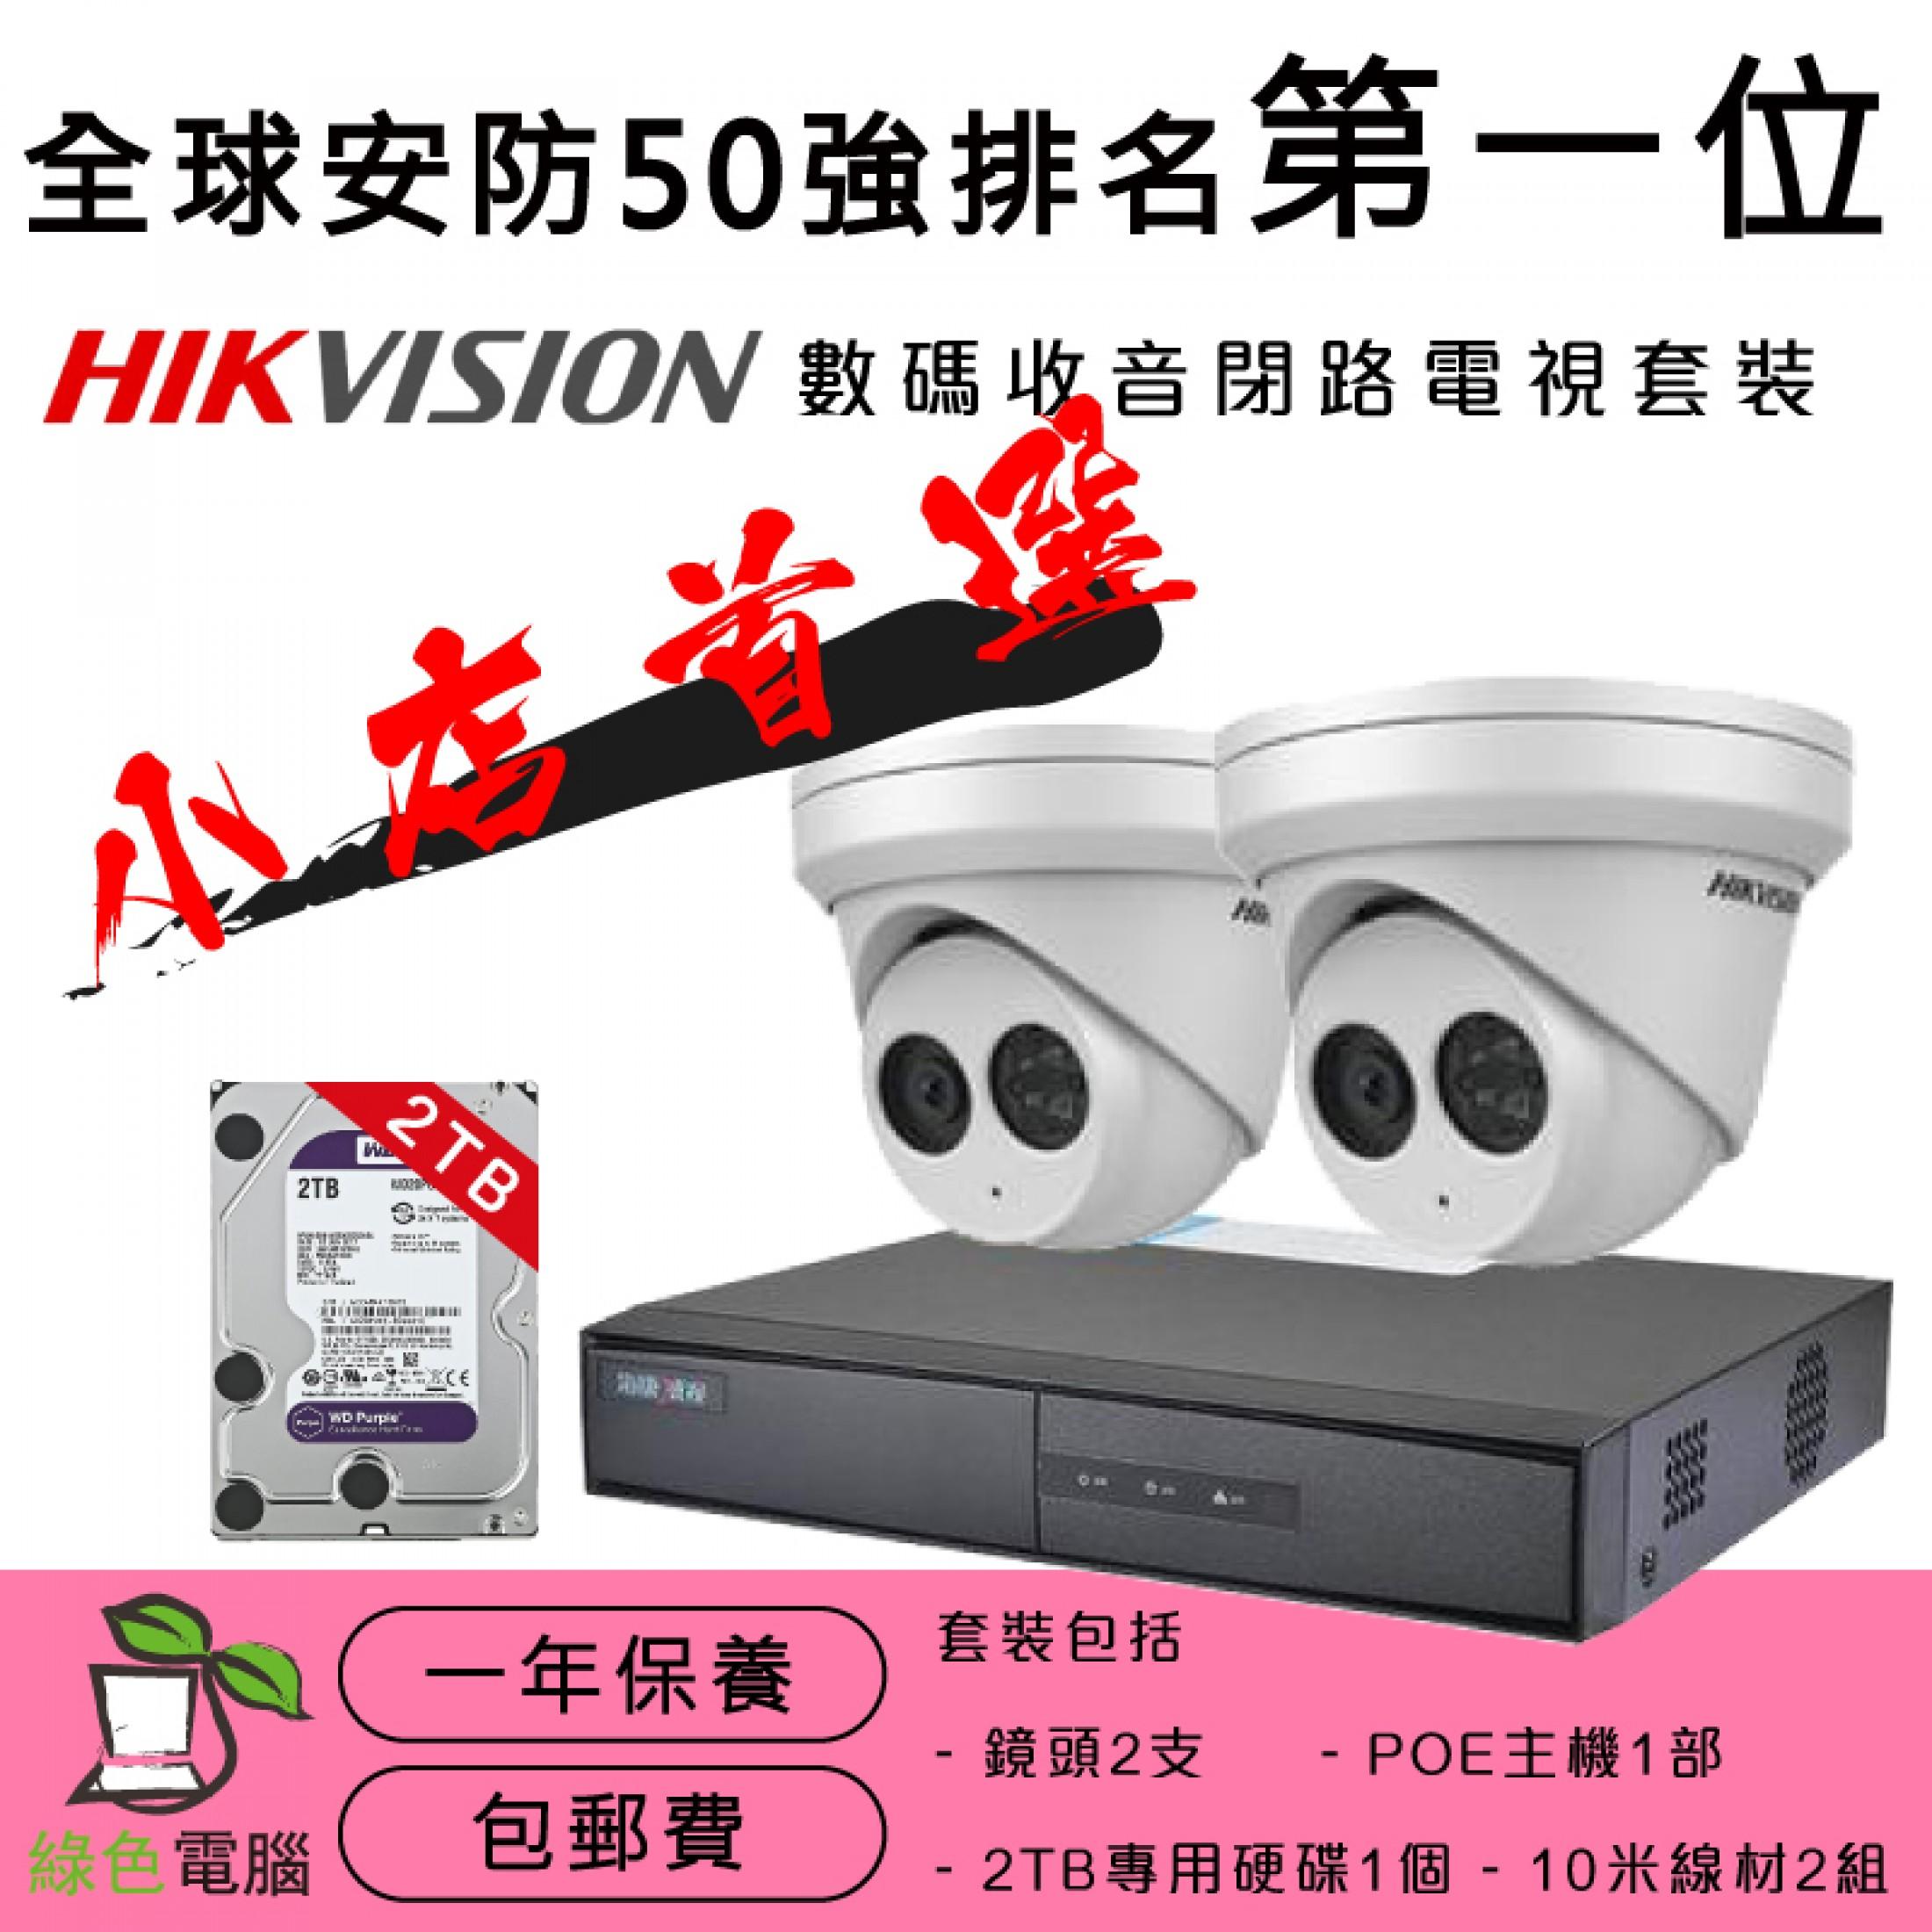 Hikvisoin 數碼收音閉路電視套裝 (收音/夜視/IP66防水防塵)